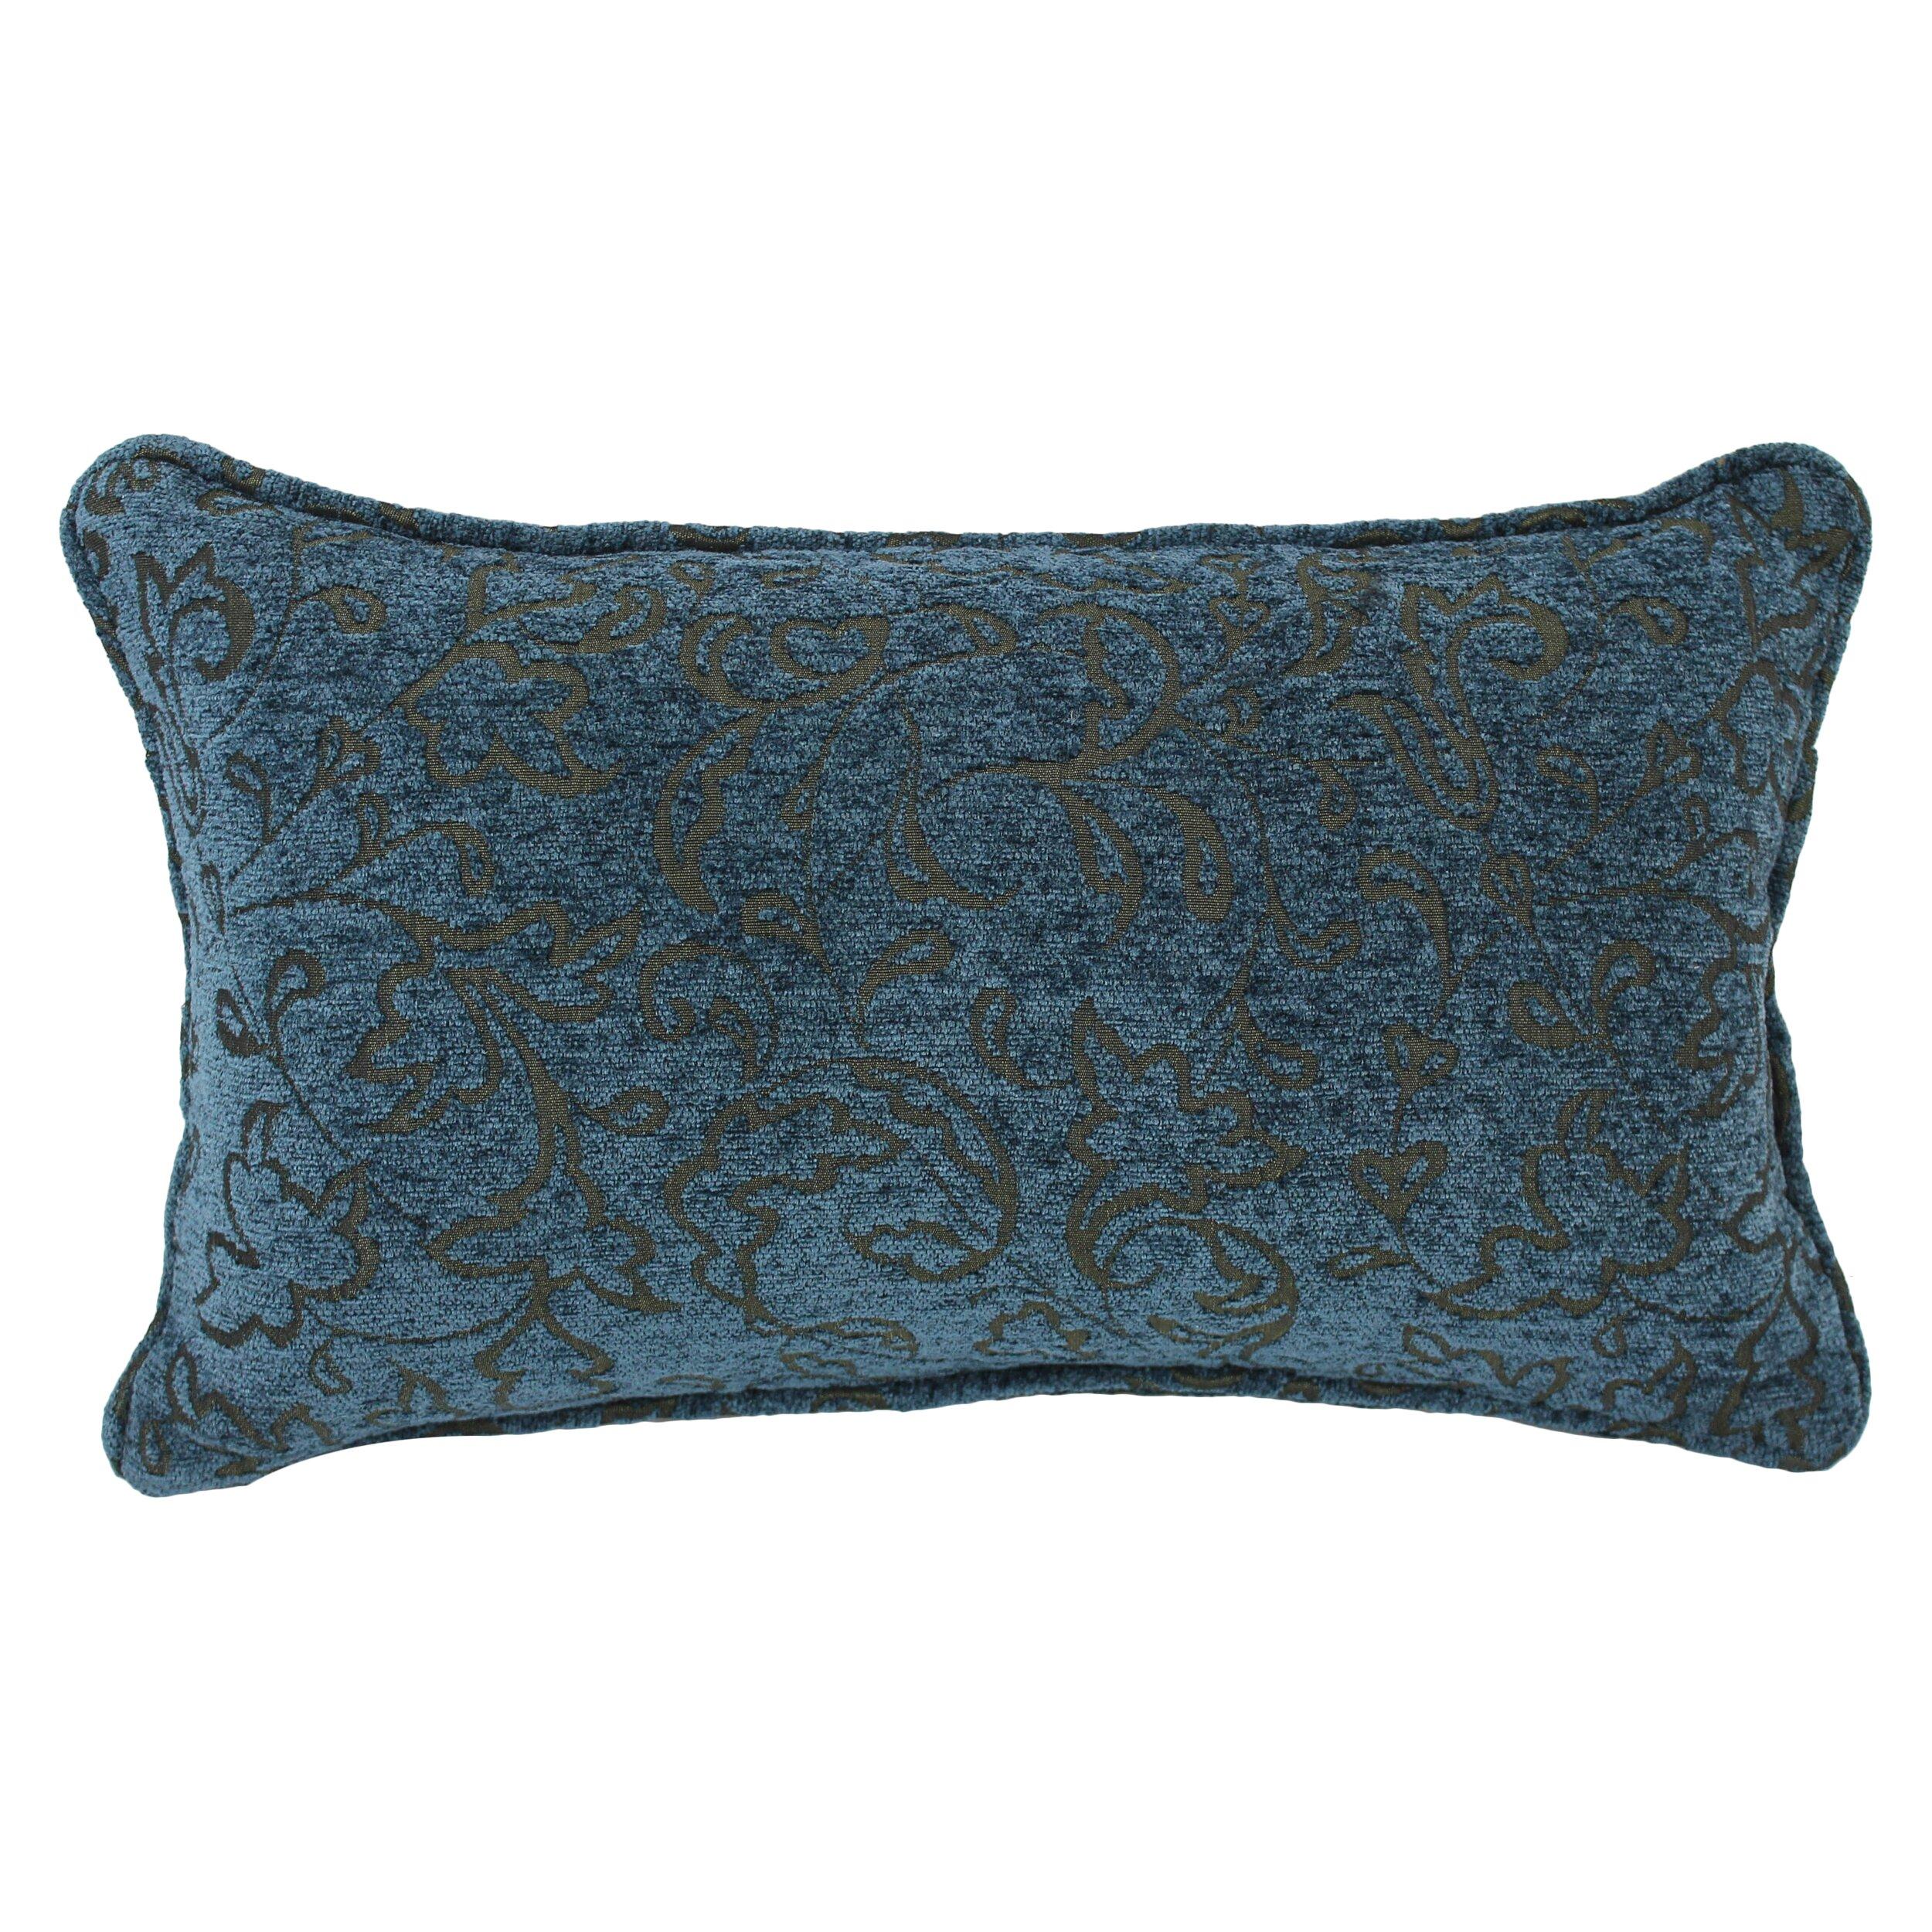 Blazing Needles Floral Jacquard Chenille Lumbar Pillow Wayfair